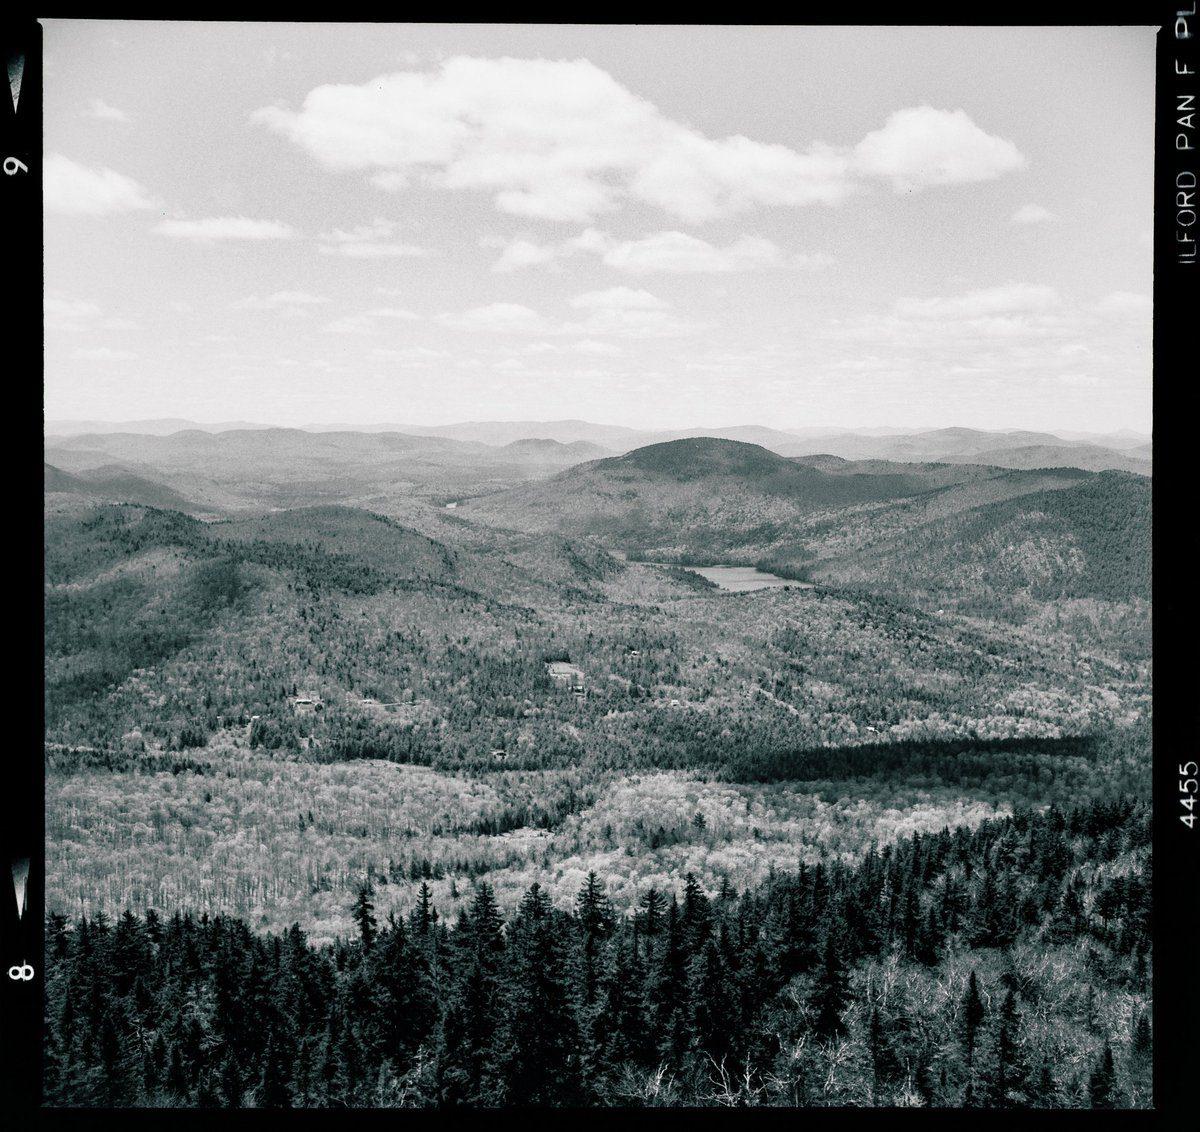 @MattAngleyPhoto Jun 3 Hootlet More 📍Crane Mountain, Adirondacks 📷 Zeiss Ikoflex 1C 🎞 Ilford Pan F Plus #fridayfavourites #panFplus #endless #ilfordphoto #believeinfilm #mediumformat #landscapephotography #zeiss #blackandwhite #photography